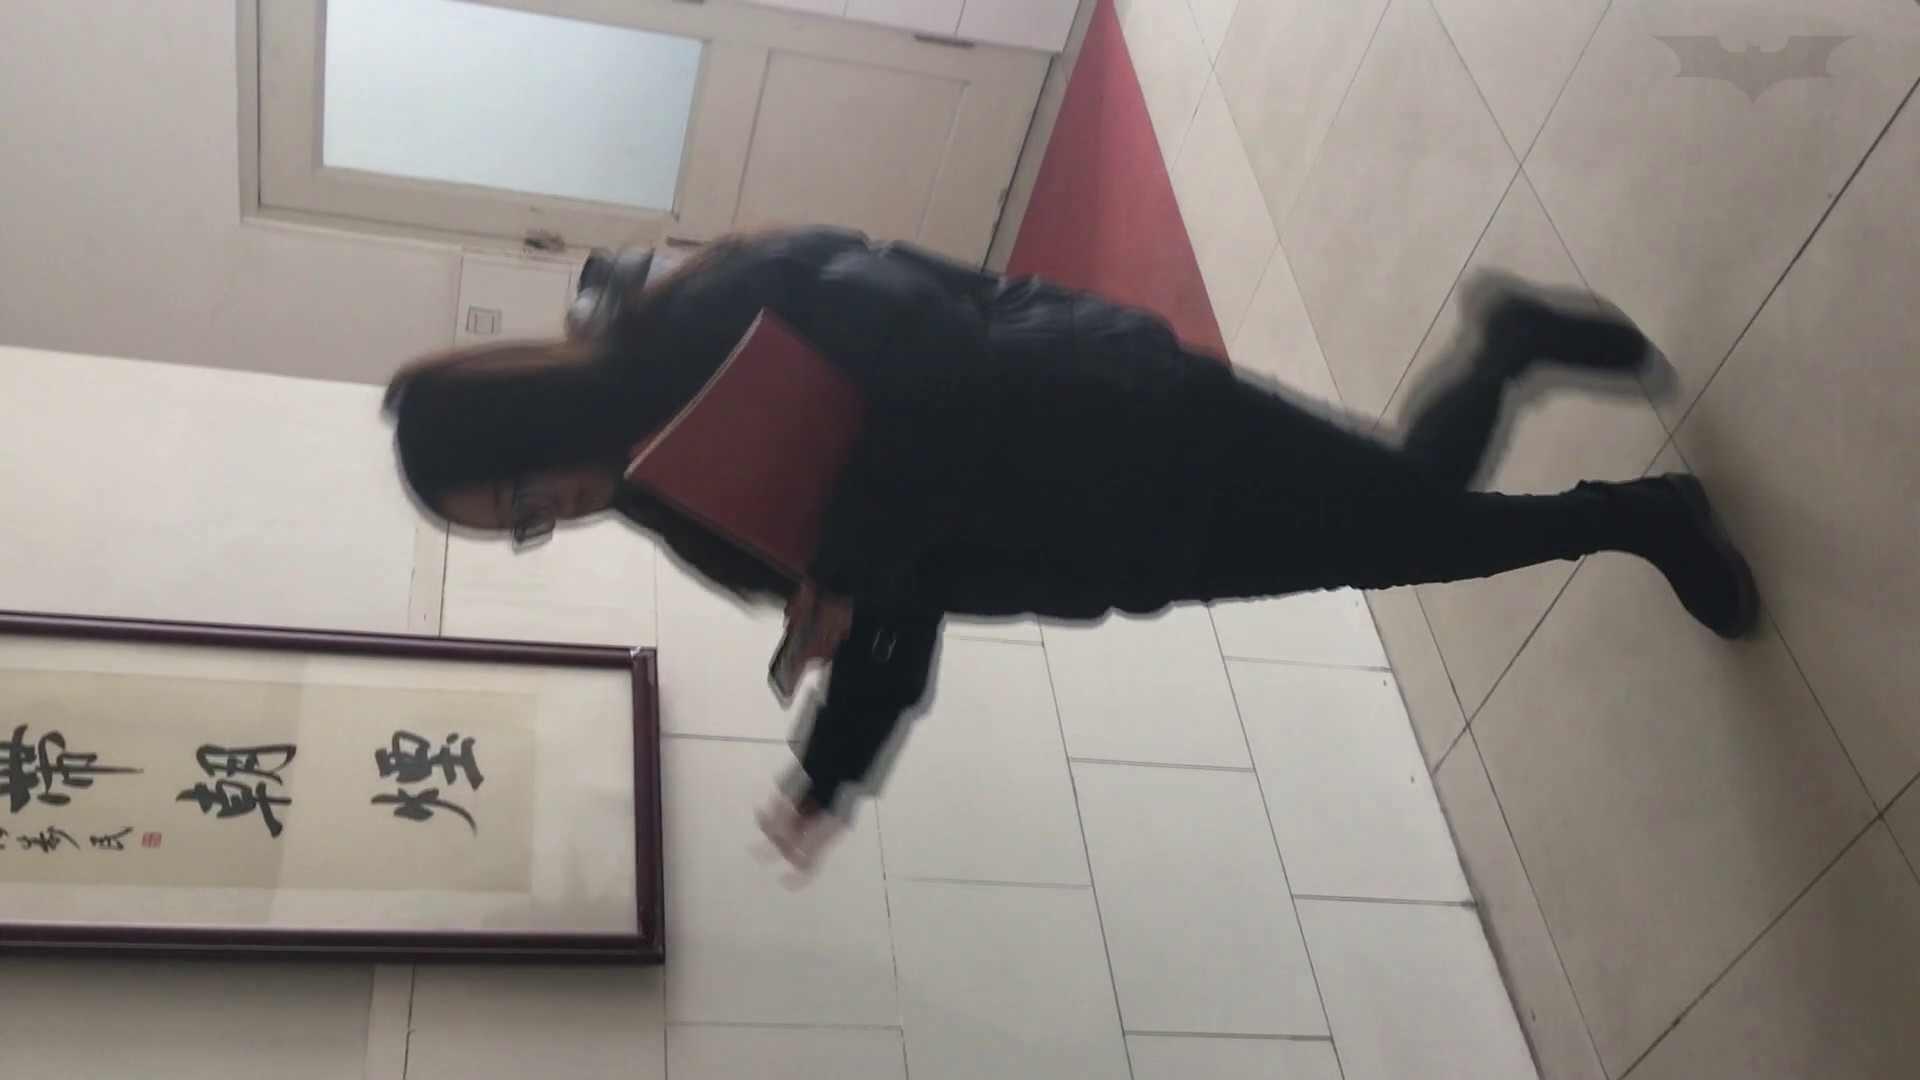 芸術大学ガチ潜入盗撮 JD盗撮 美女の洗面所の秘密 Vol.88 盗撮編 スケベ動画紹介 83枚 19